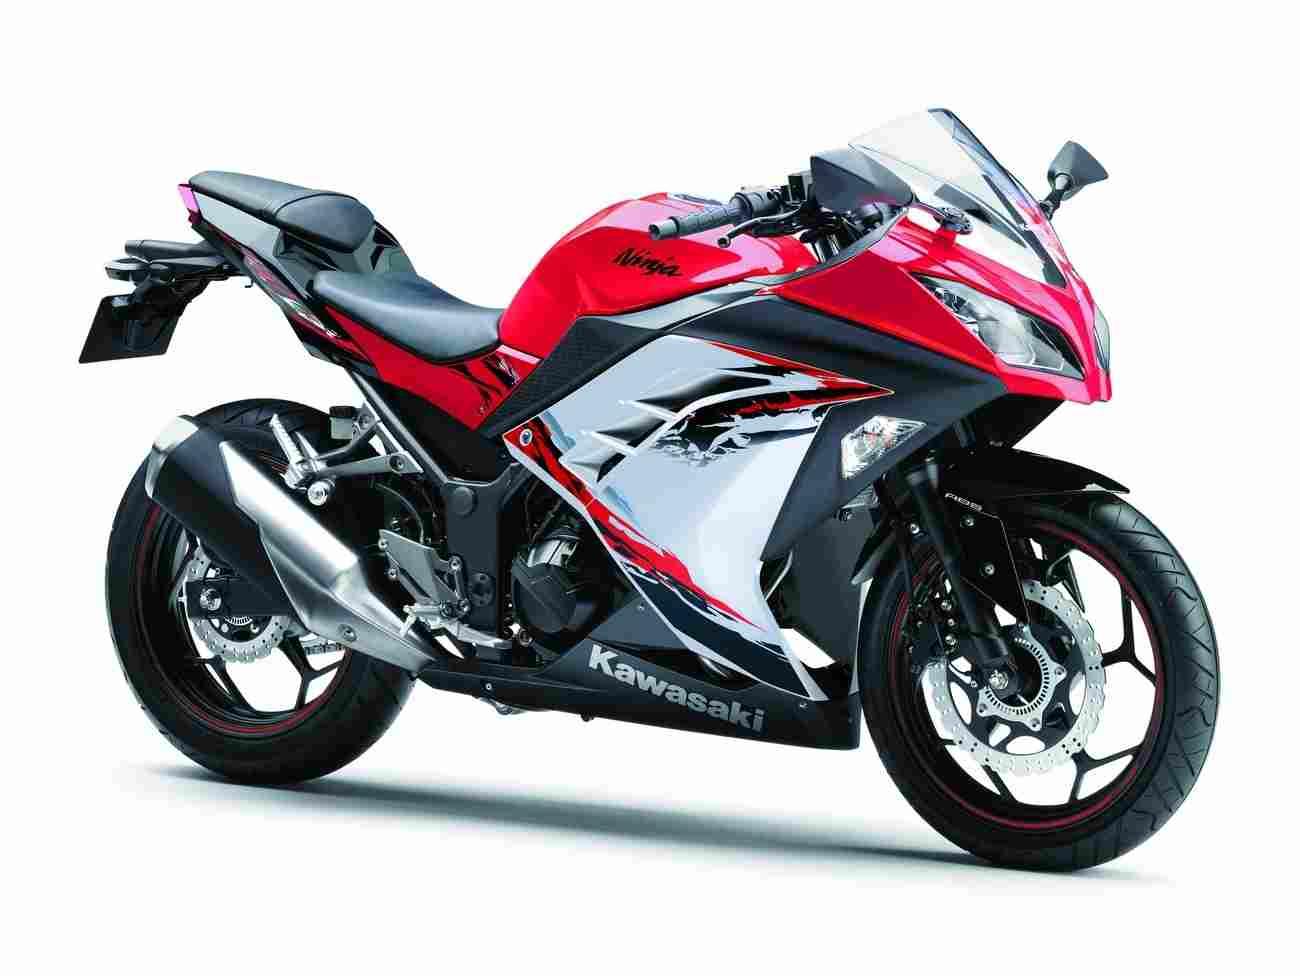 Daftar Harga Motor Kawasaki Ninja 250 Blitz Athlete Baru Bekas 2013 ...